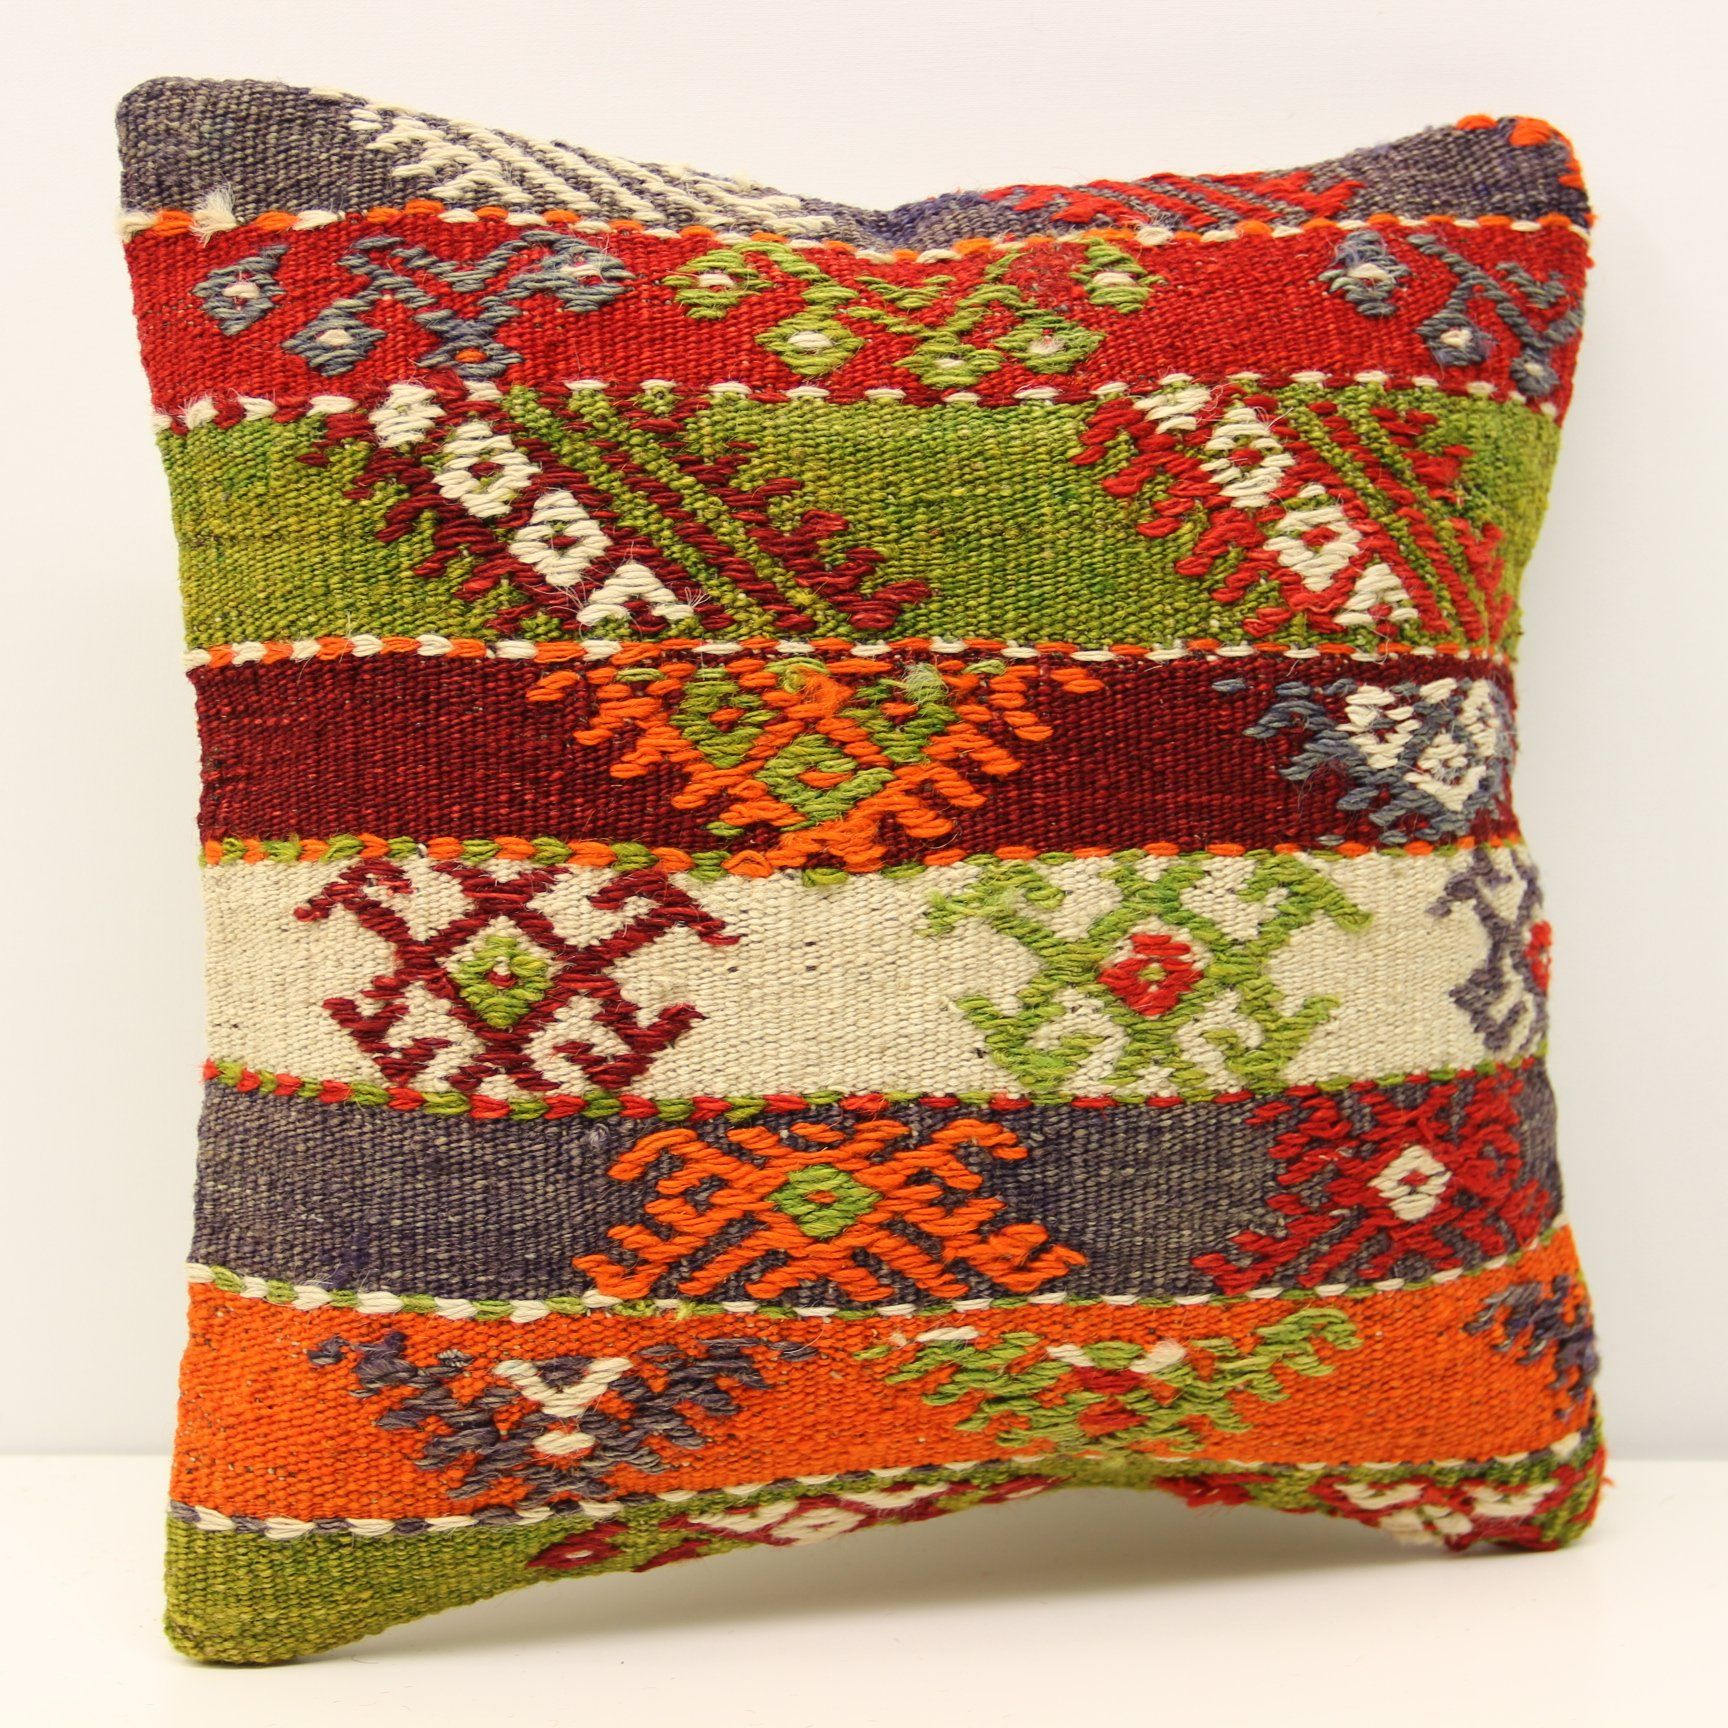 Home decor pillow cover x inch x cm throw kilim pillow